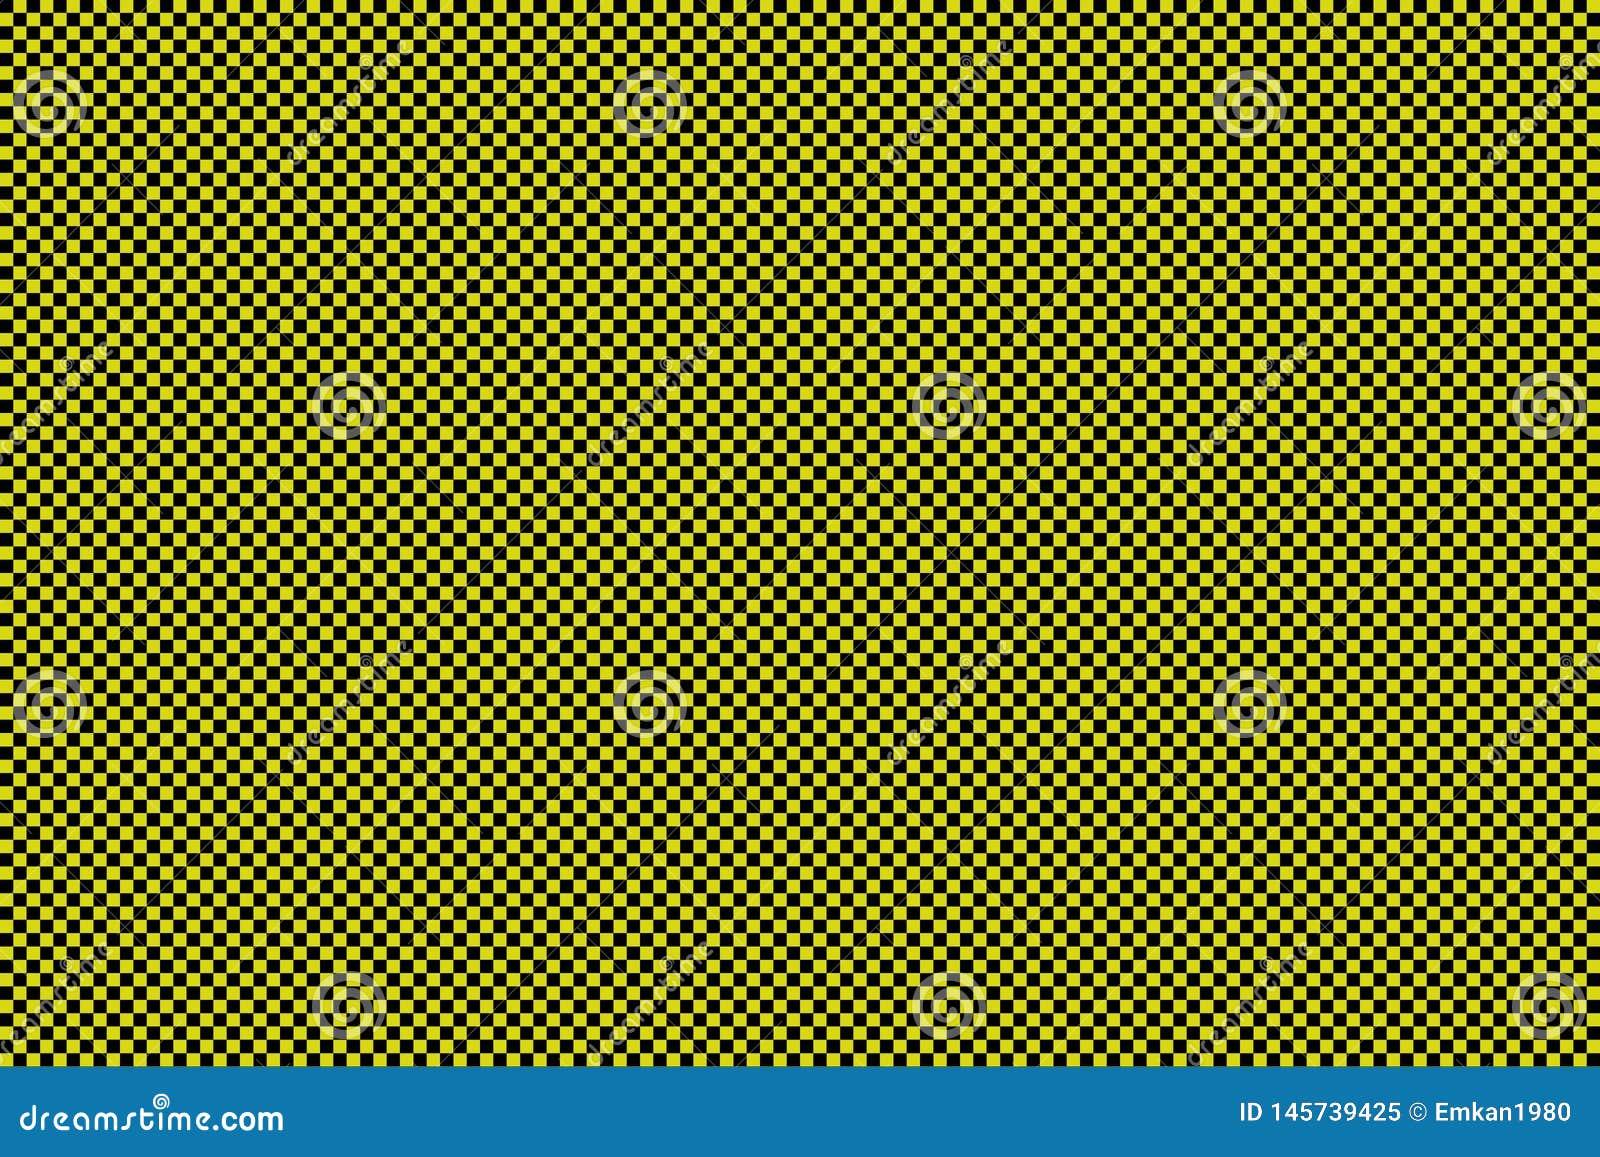 Fundo preto e amarelo do tabuleiro de damas - ilustration do vetor - EPS 10